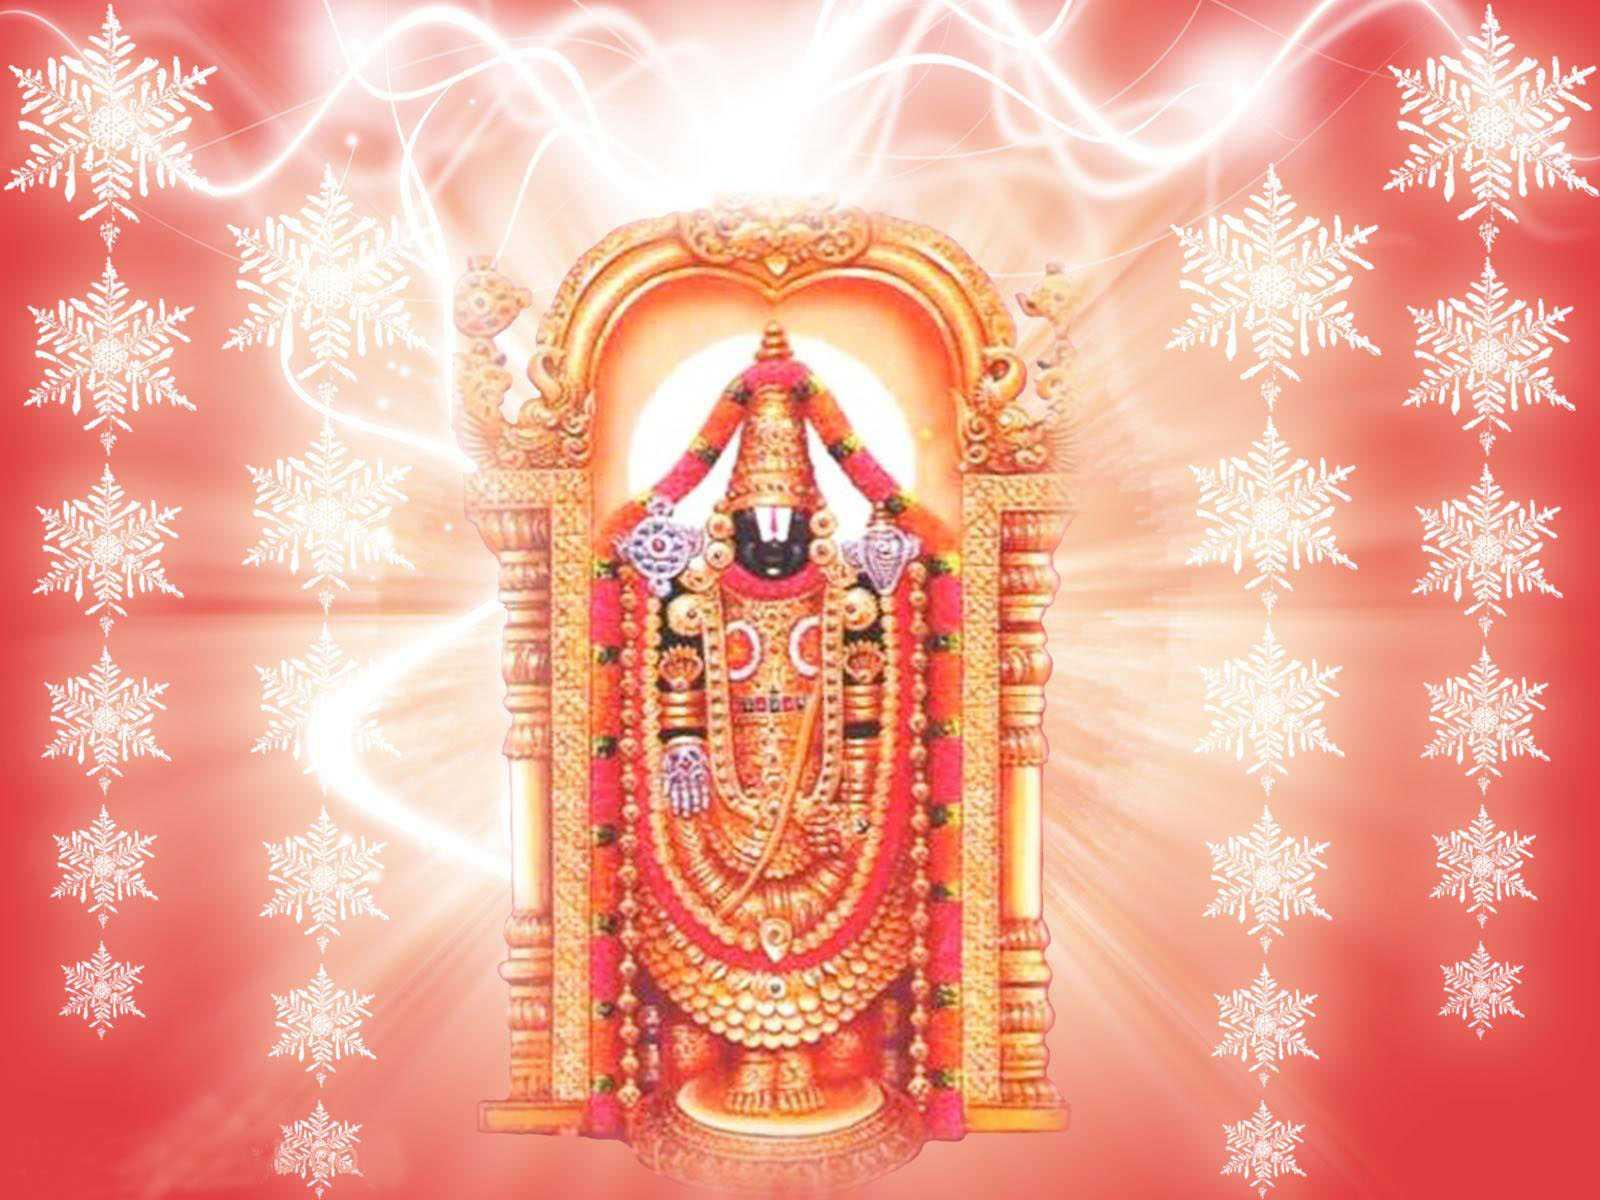 Lord balaji wallpaper